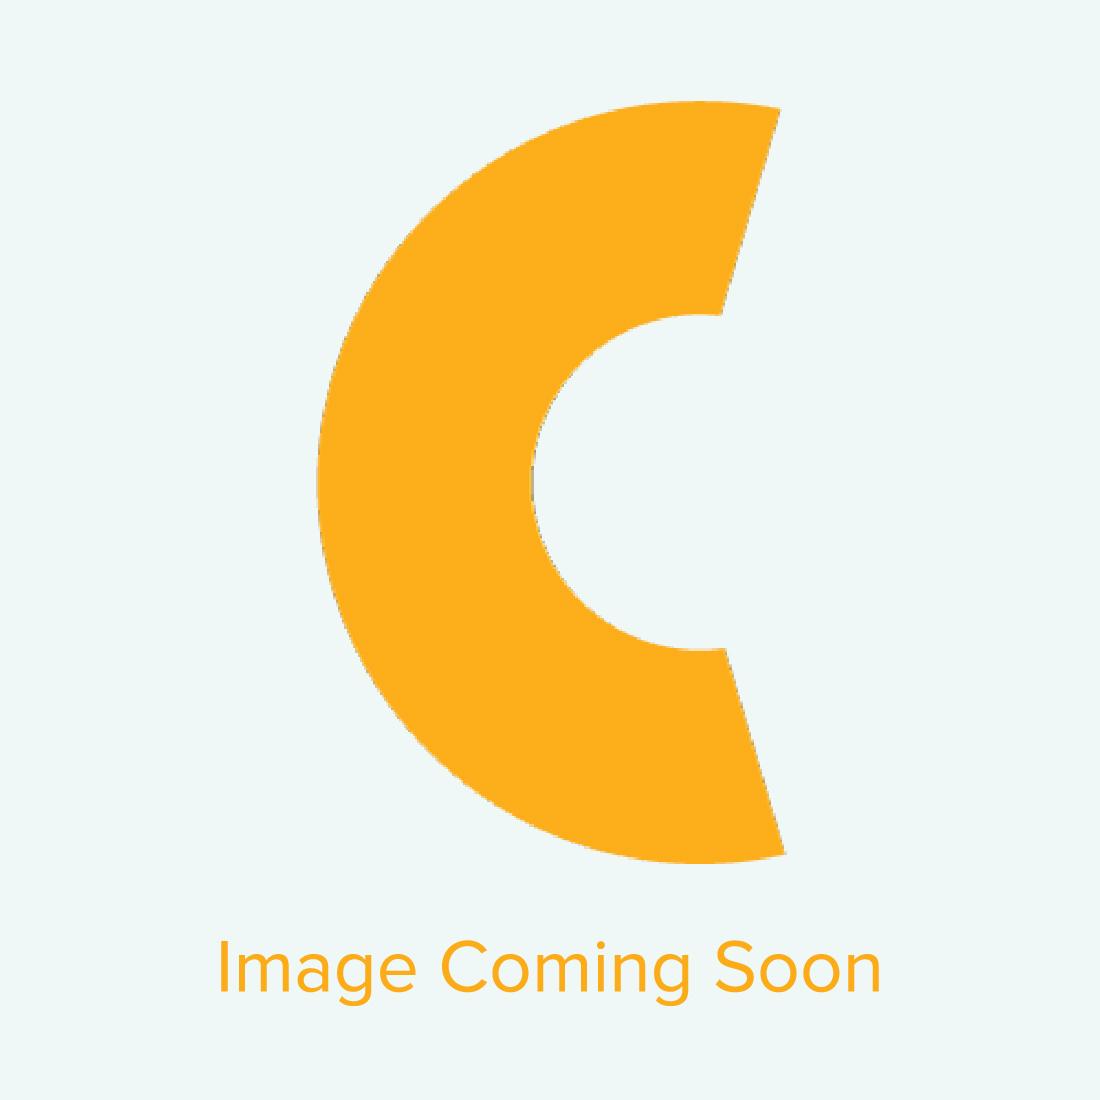 "Graphtec CE LITE-50 20"" Cutting Plotter - OPEN BOX"